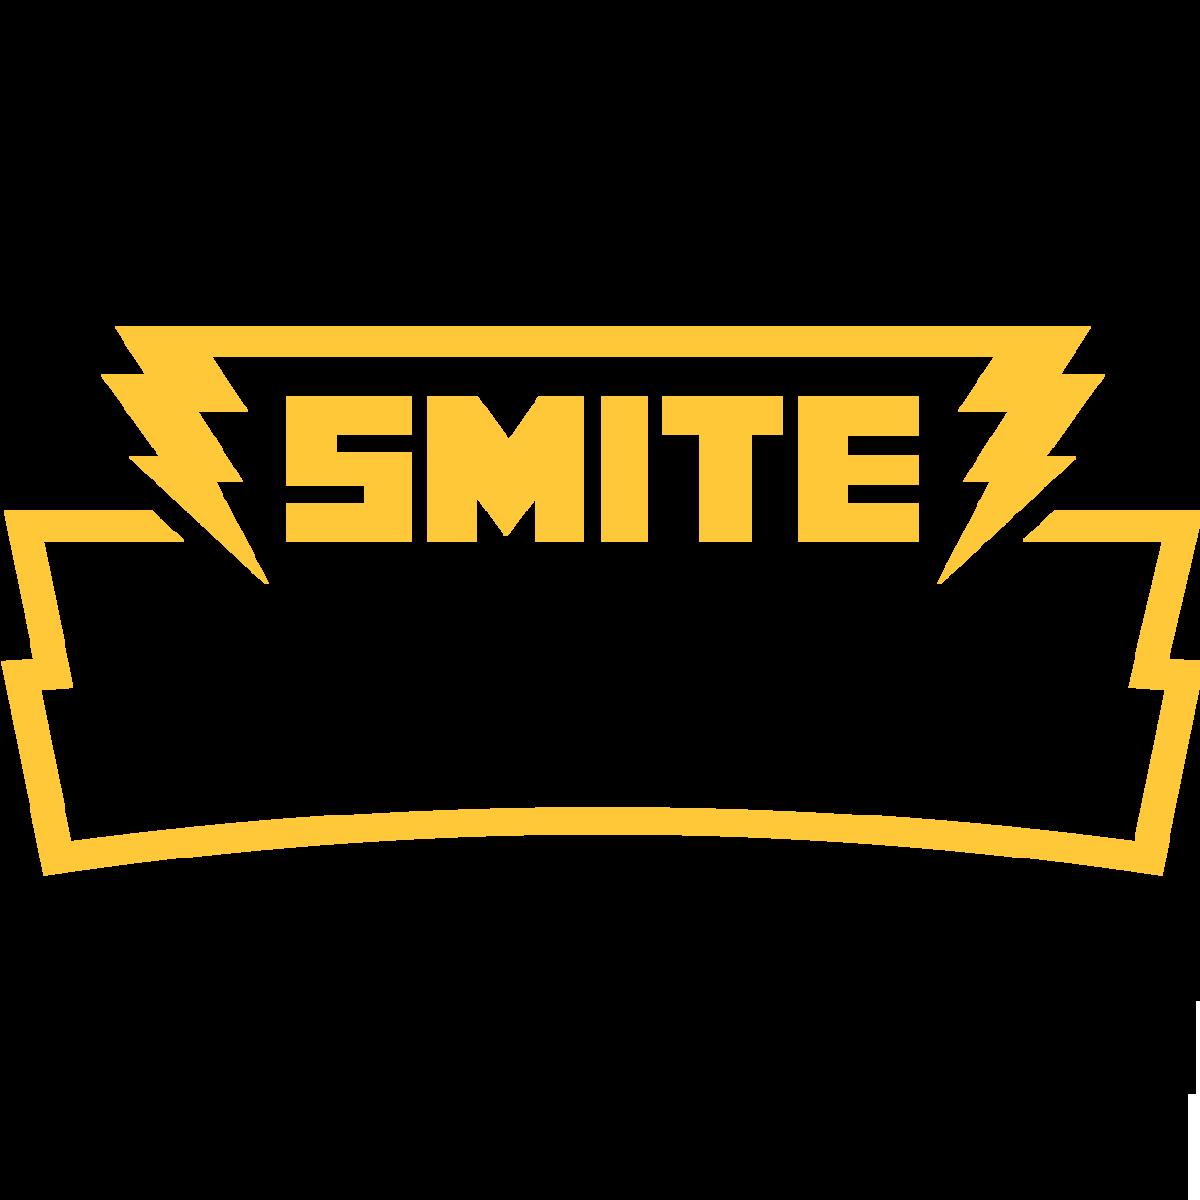 Smite World Championship 2021